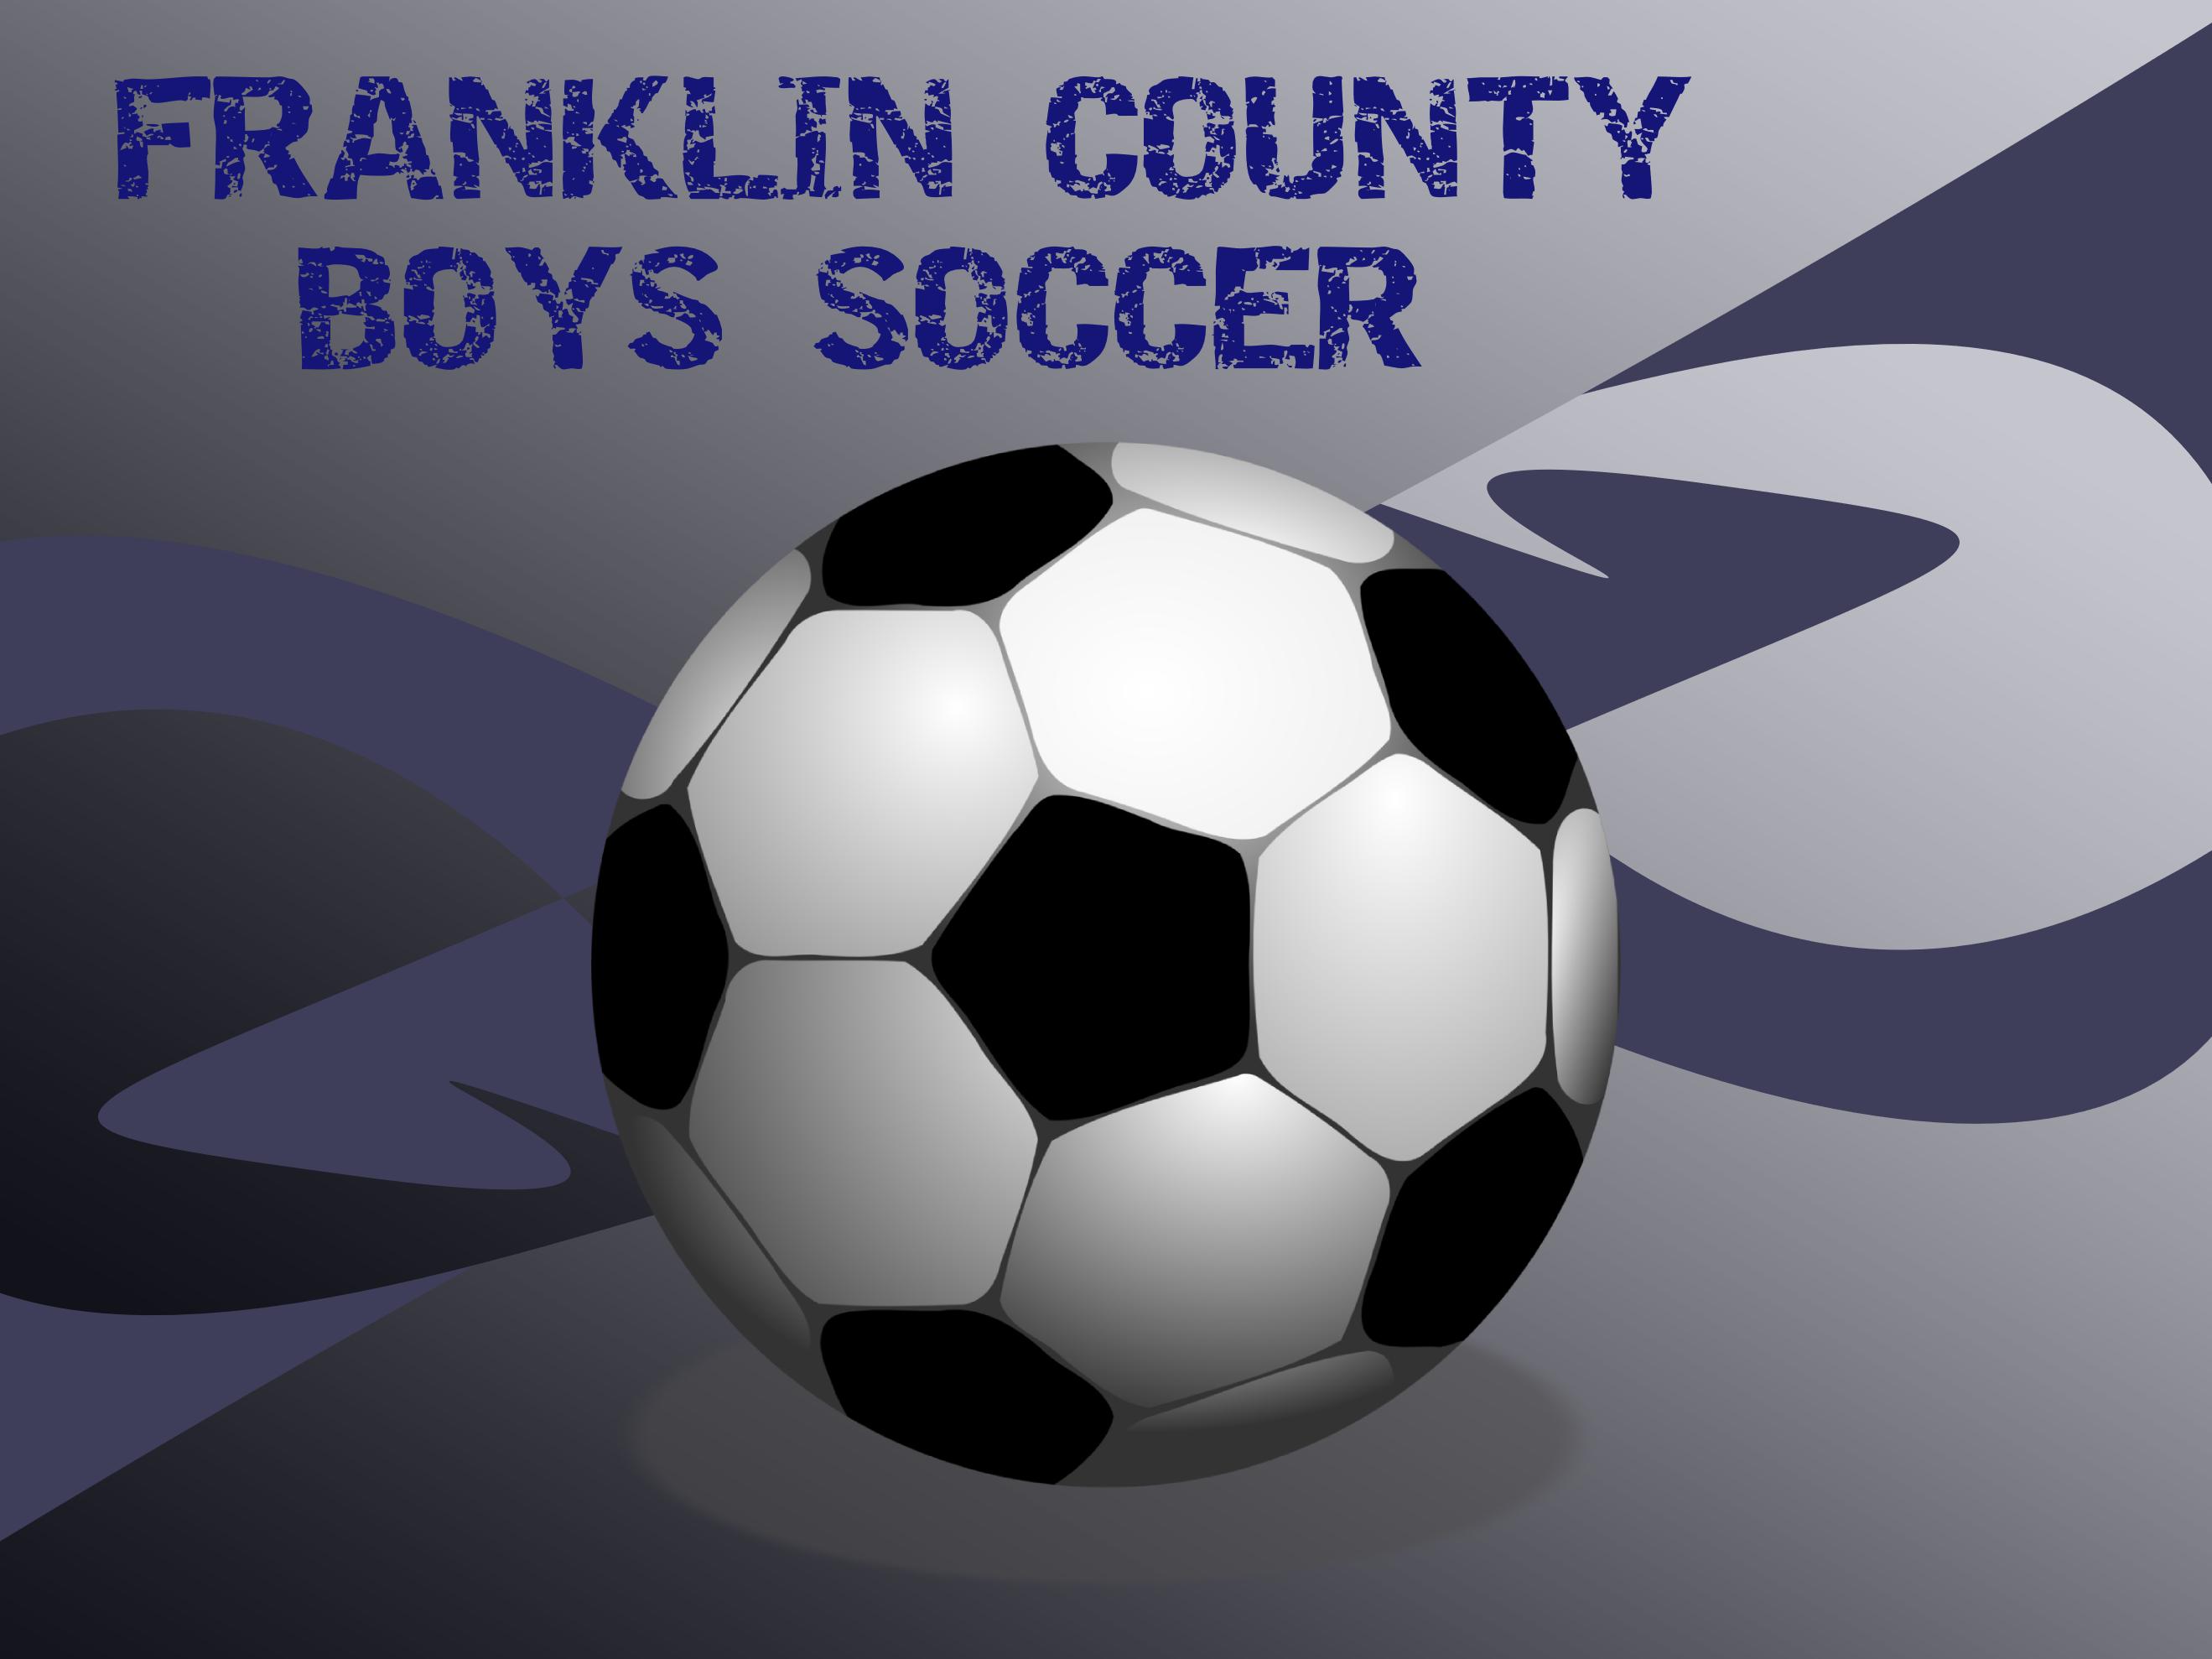 FC Boy's Soccer